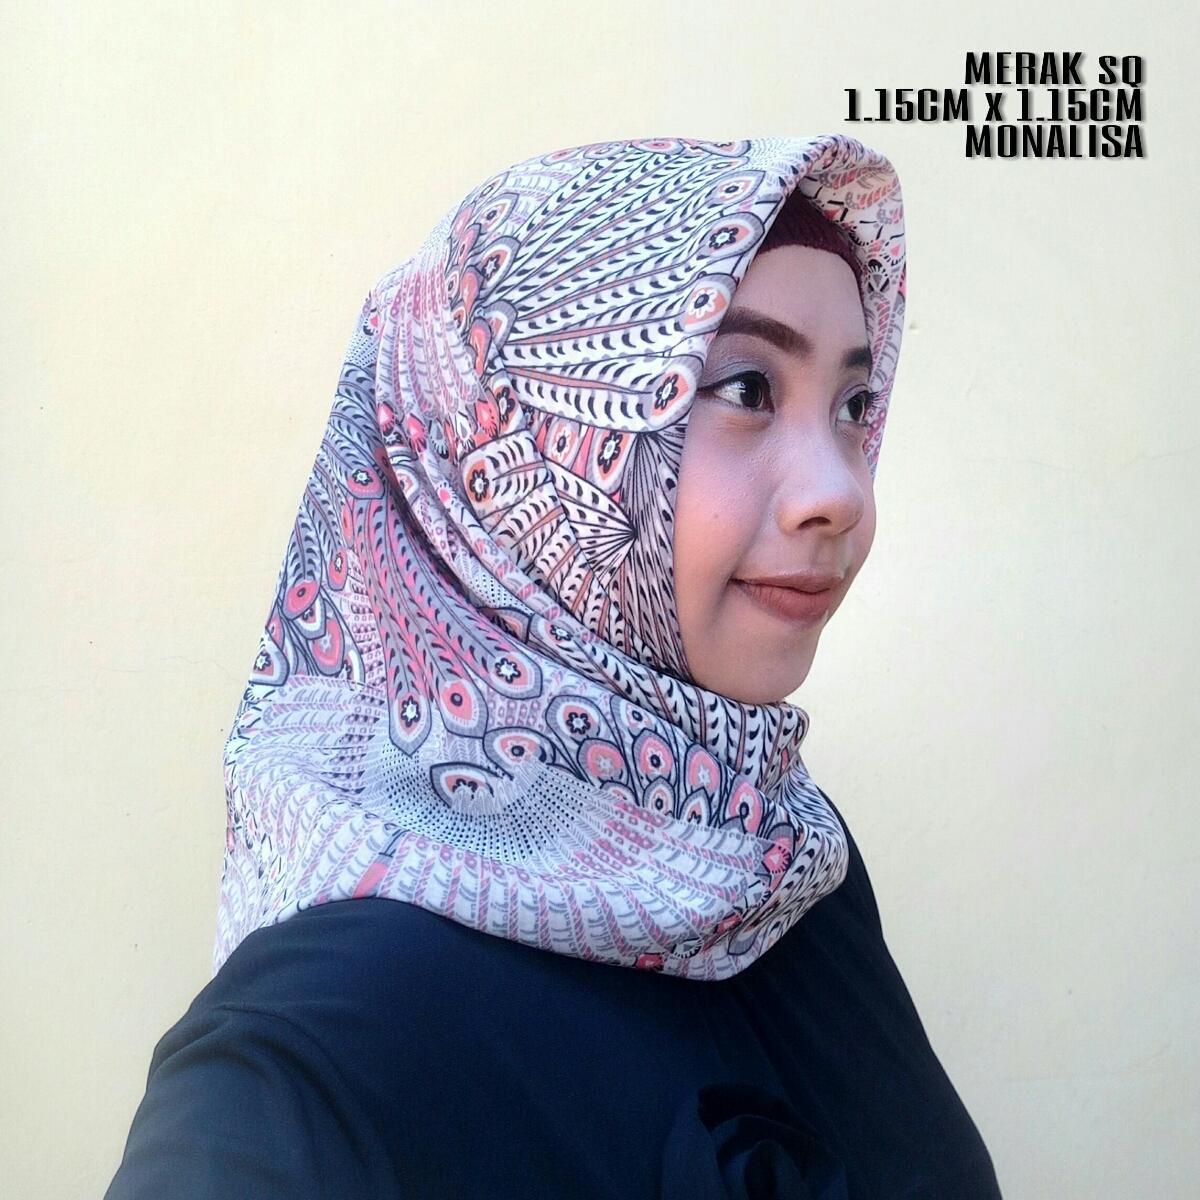 El Zahrana Hijab - Kerudung Segi Empat - Jilbab Segi Empat - Hijab Segi Empat -. Source ... Premium Hijab Monalisa | Shopee Indonesia. Source · Rp 56.700.